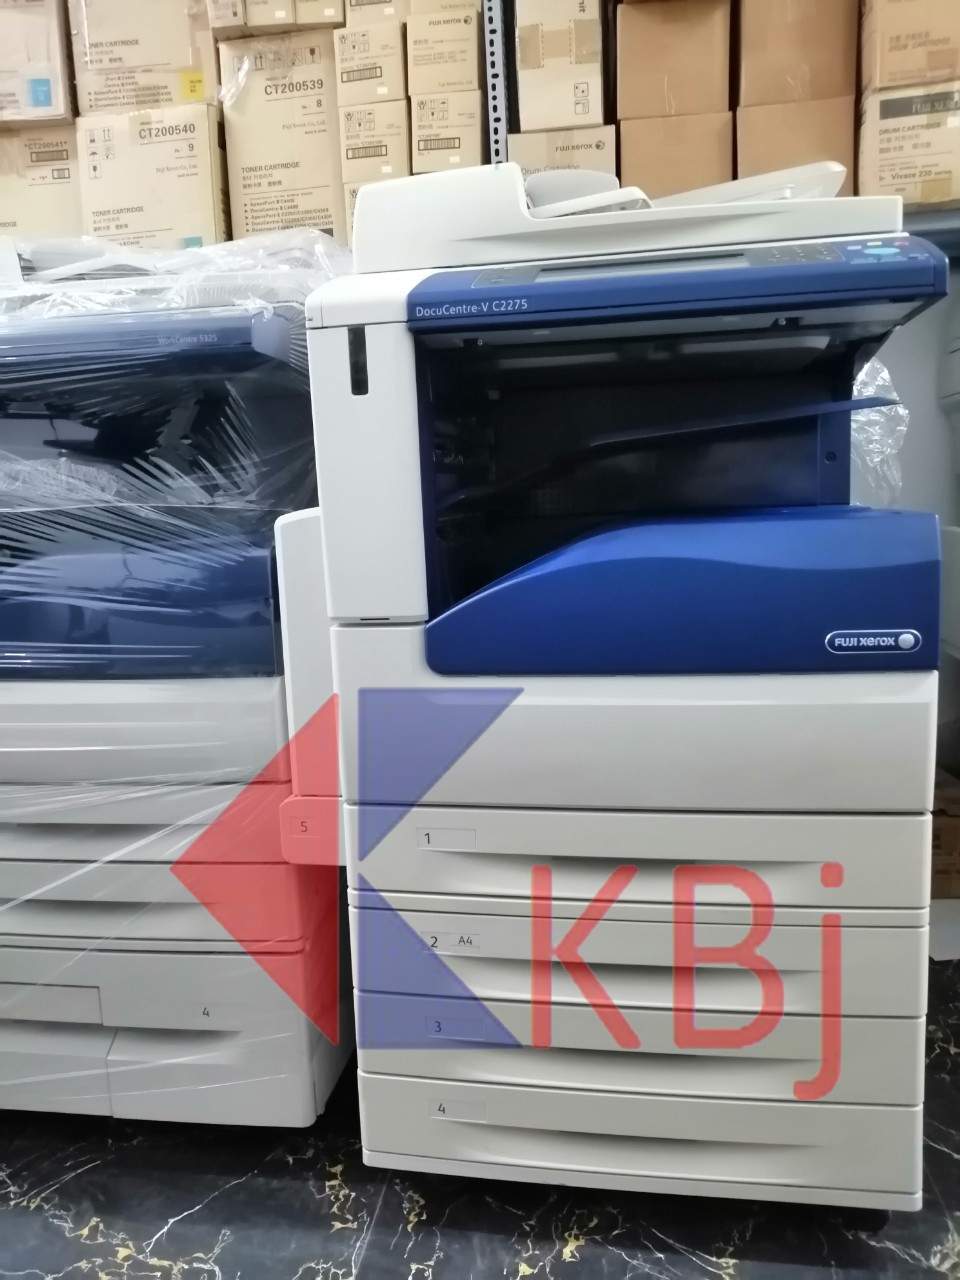 Fuji Xerox DocuCentre-V C2275/C3373/C3375